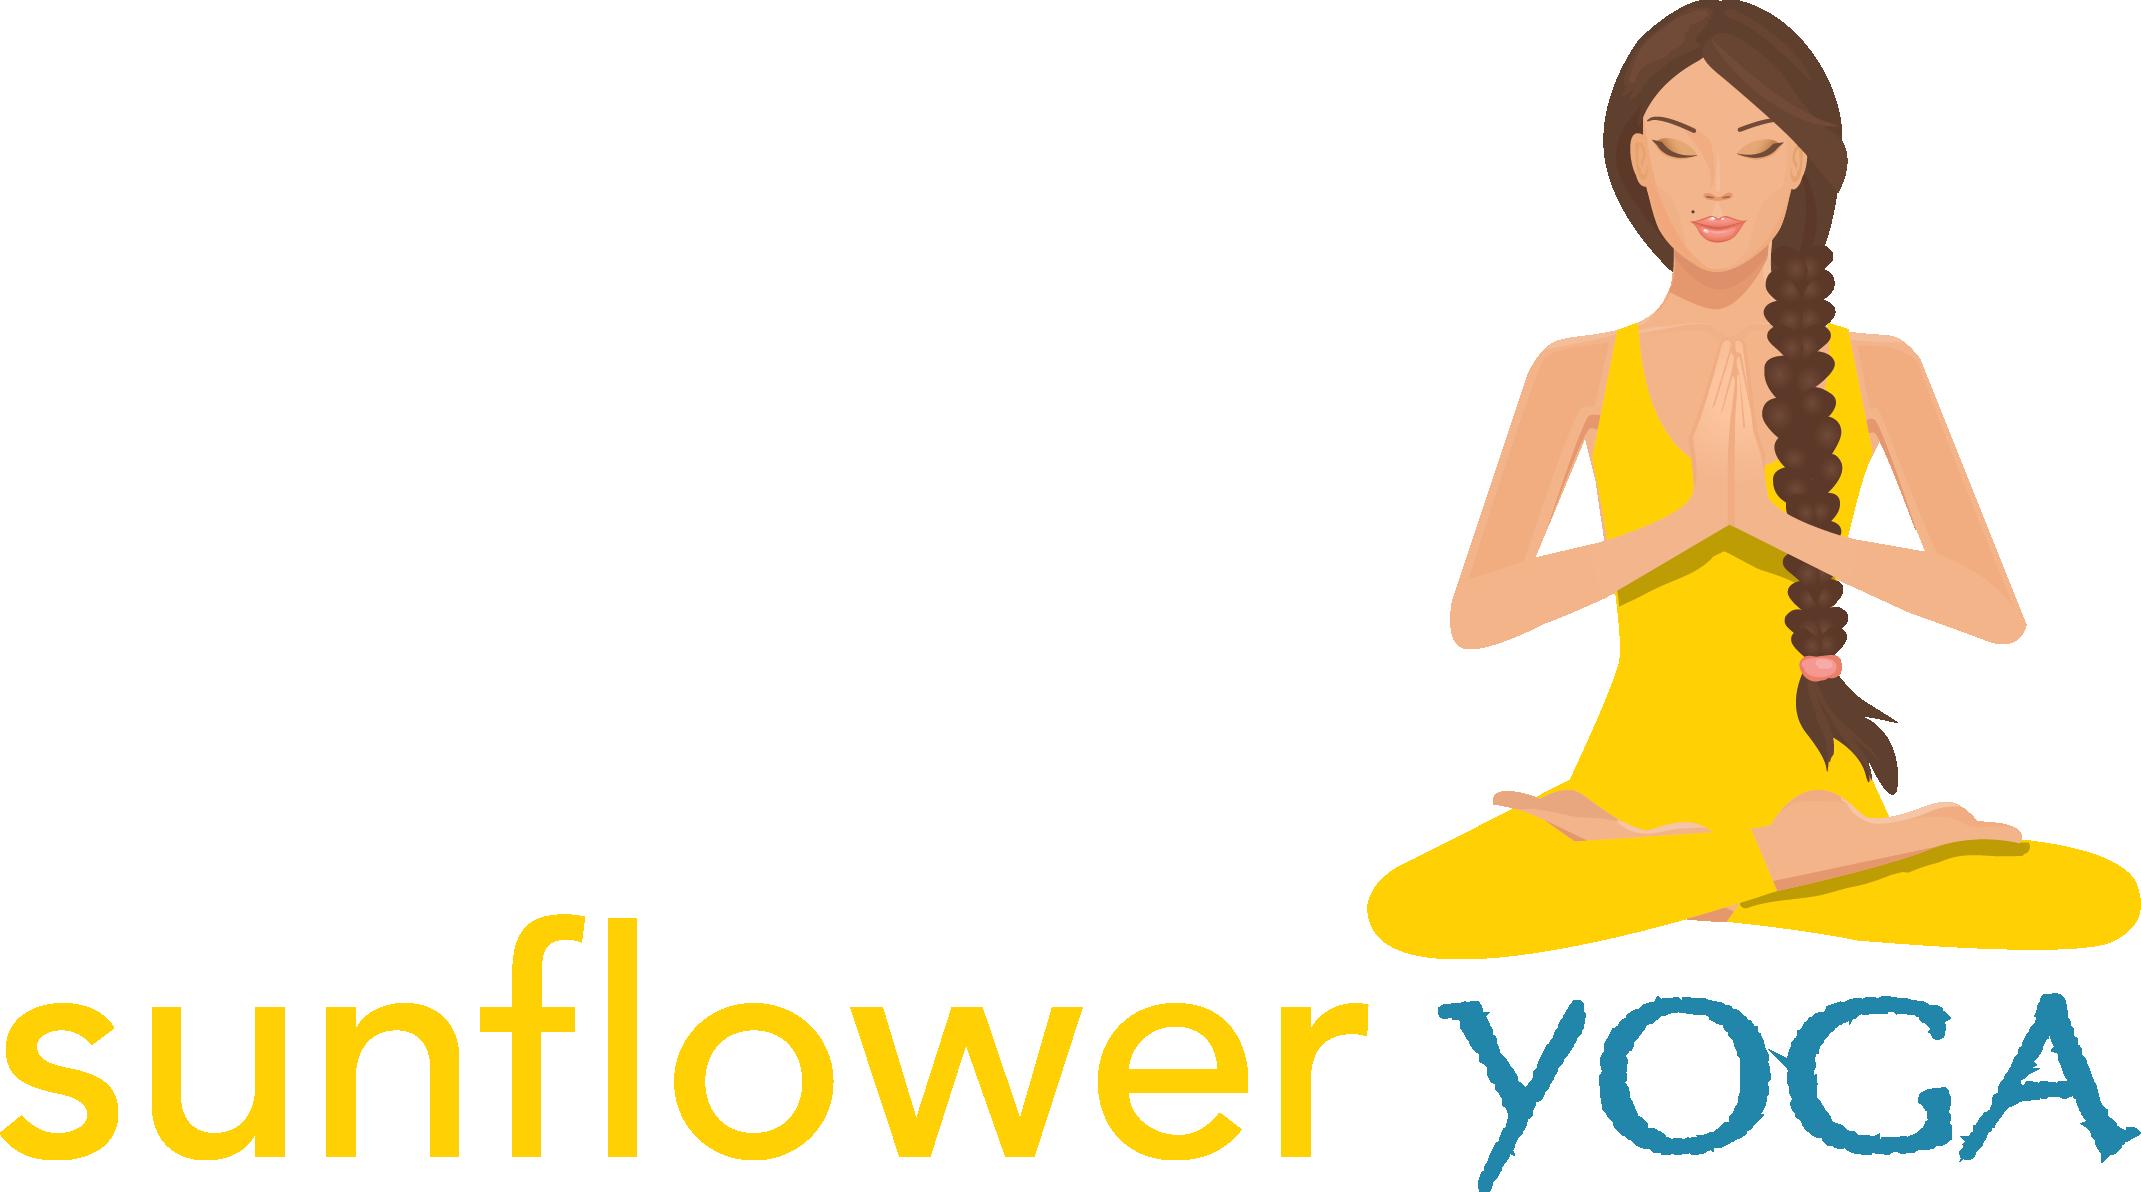 sunflowerYoga.png